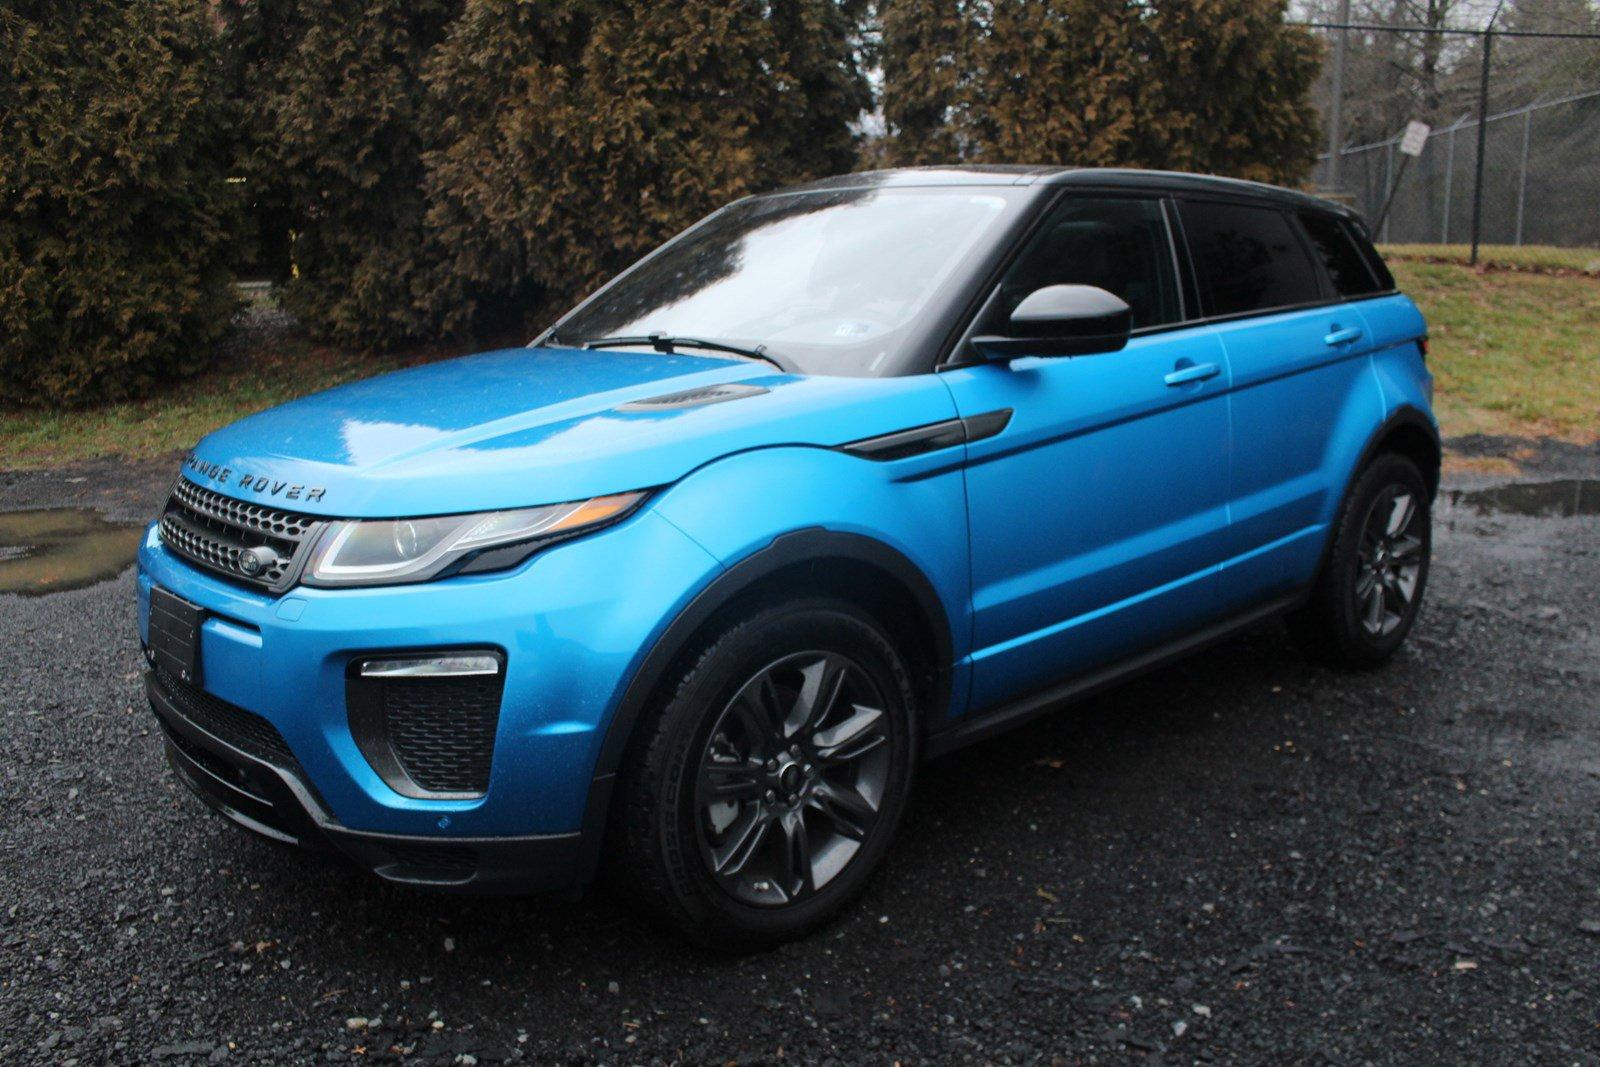 2019 Land Rover Range Rover Evoque Landmark Edition 4-Door image